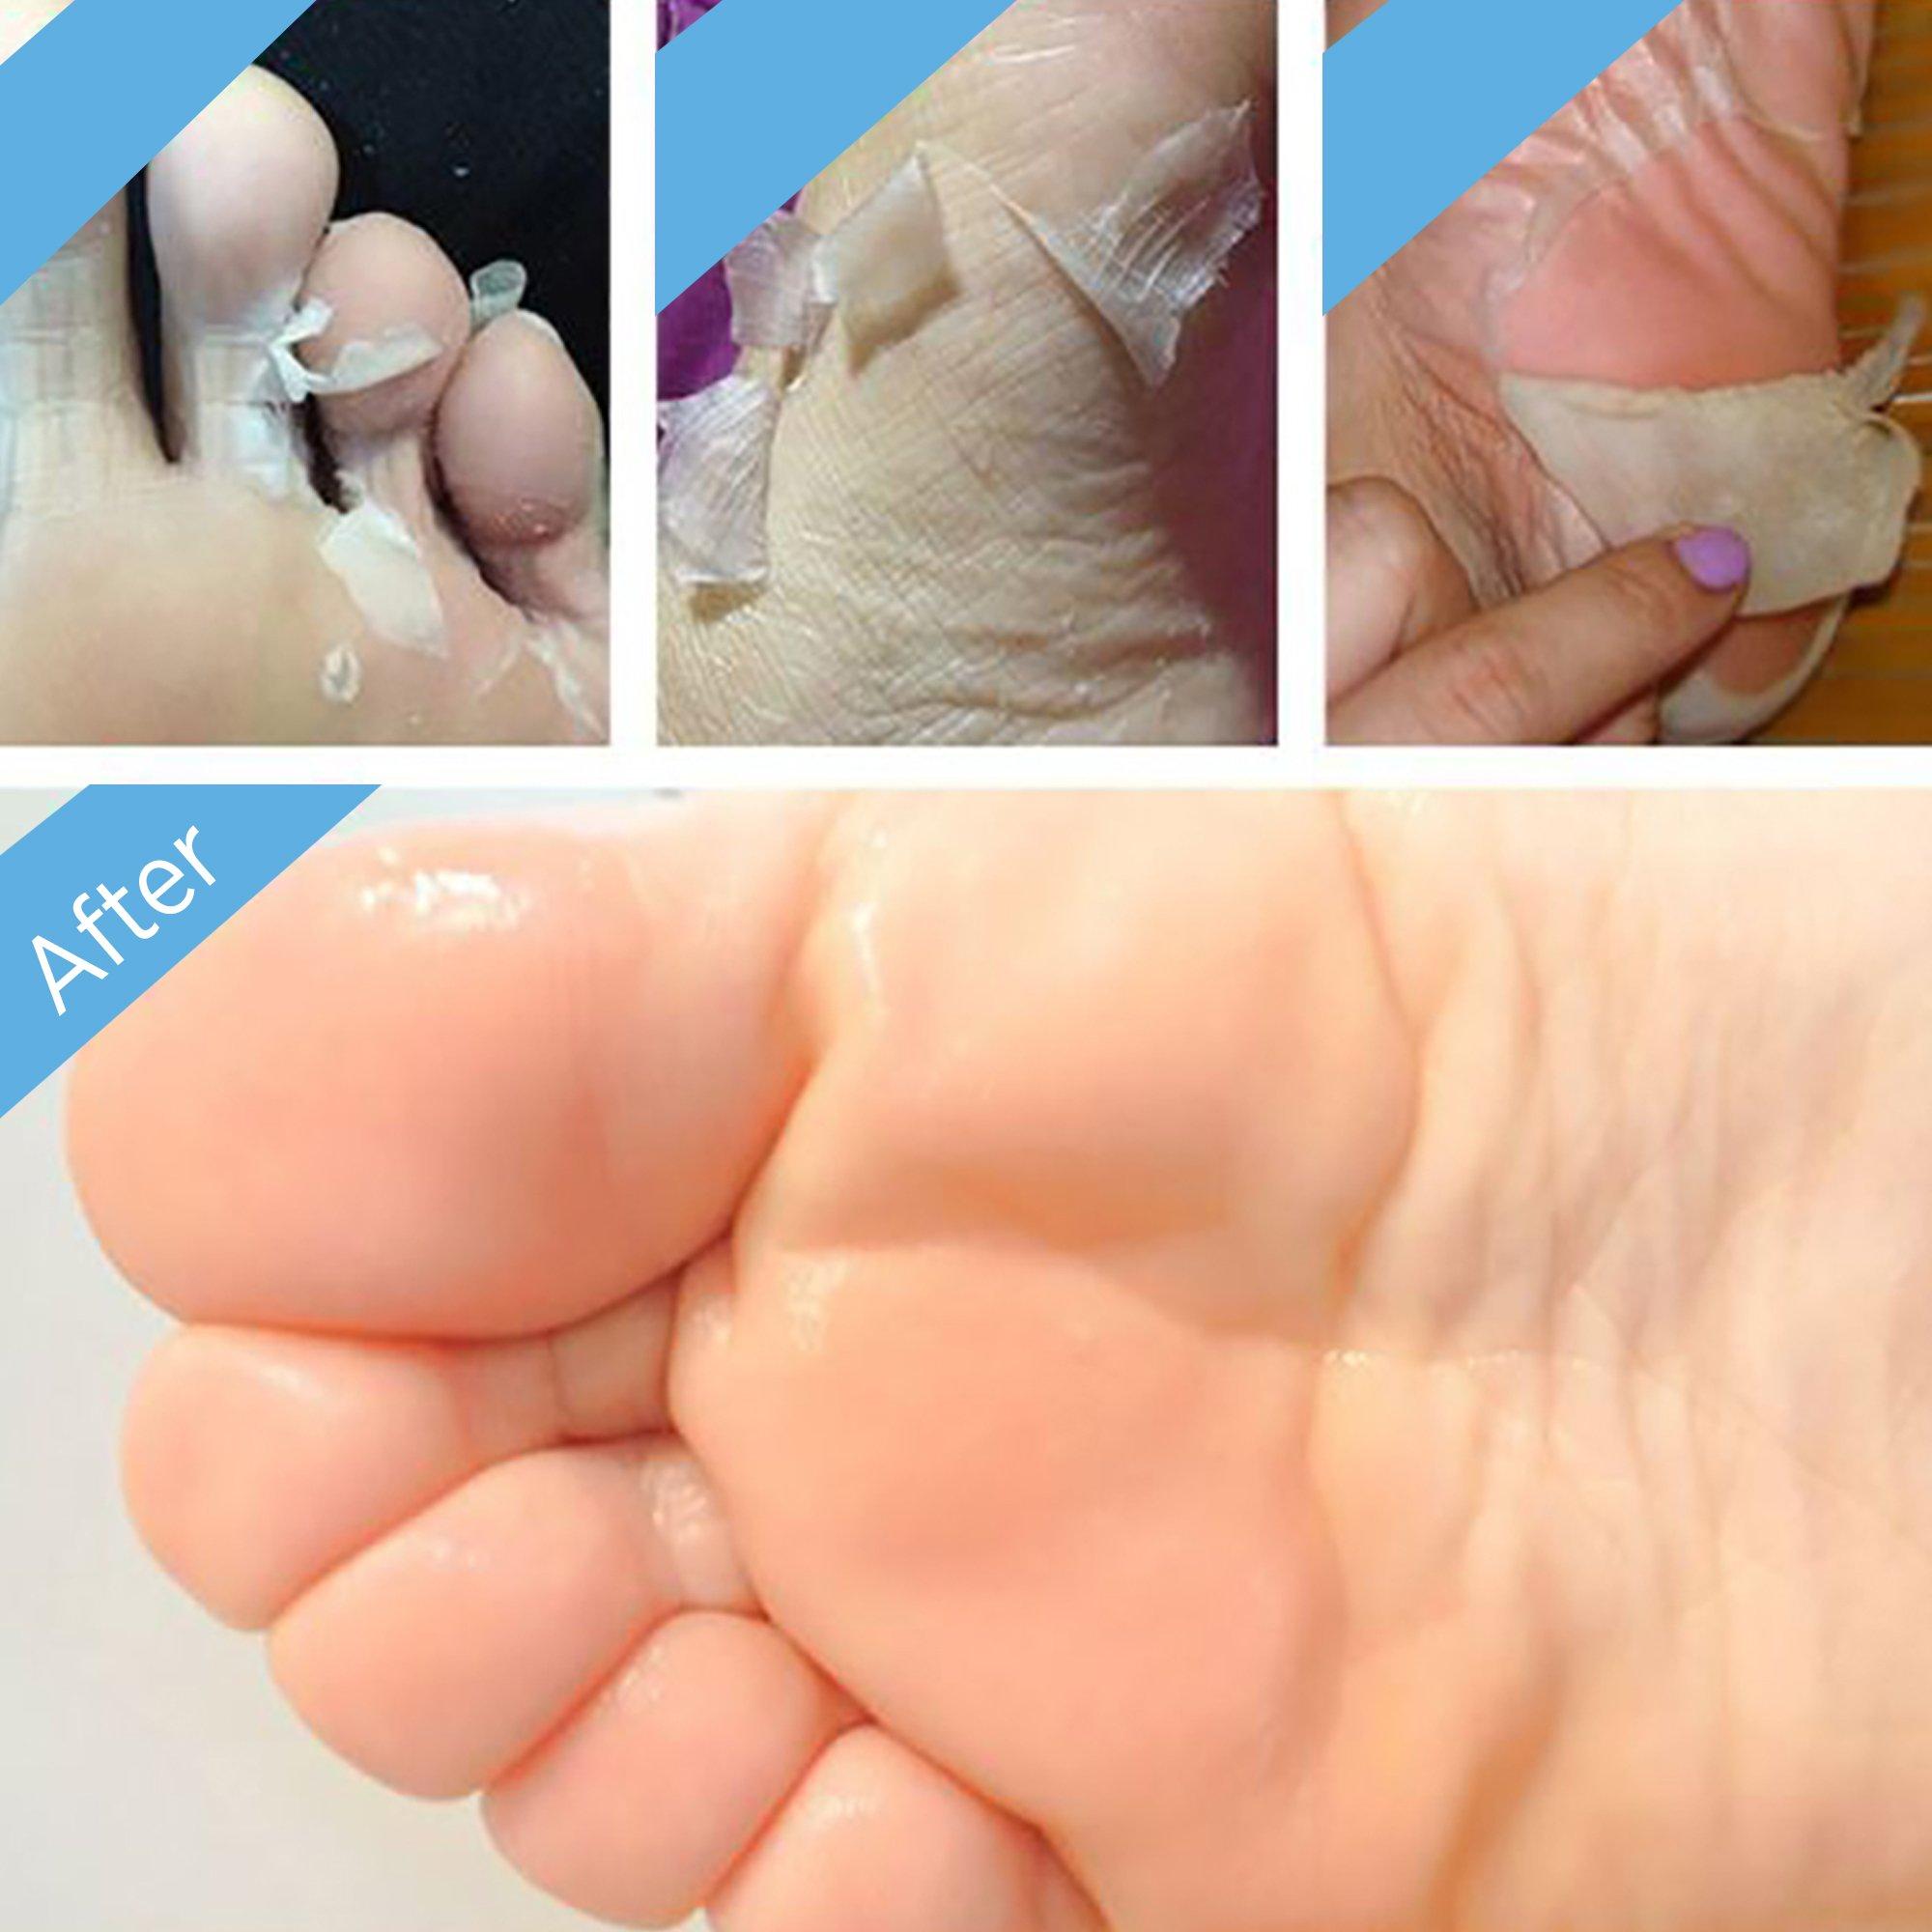 2 Pairs Exfoliating Foot Peel Mask, Soft & Smooth Feet, Peeling Away Rough Dead Skin & Calluses in 1-2 Weeks, Repairing Exfoliant by BEALUZ (Image #5)